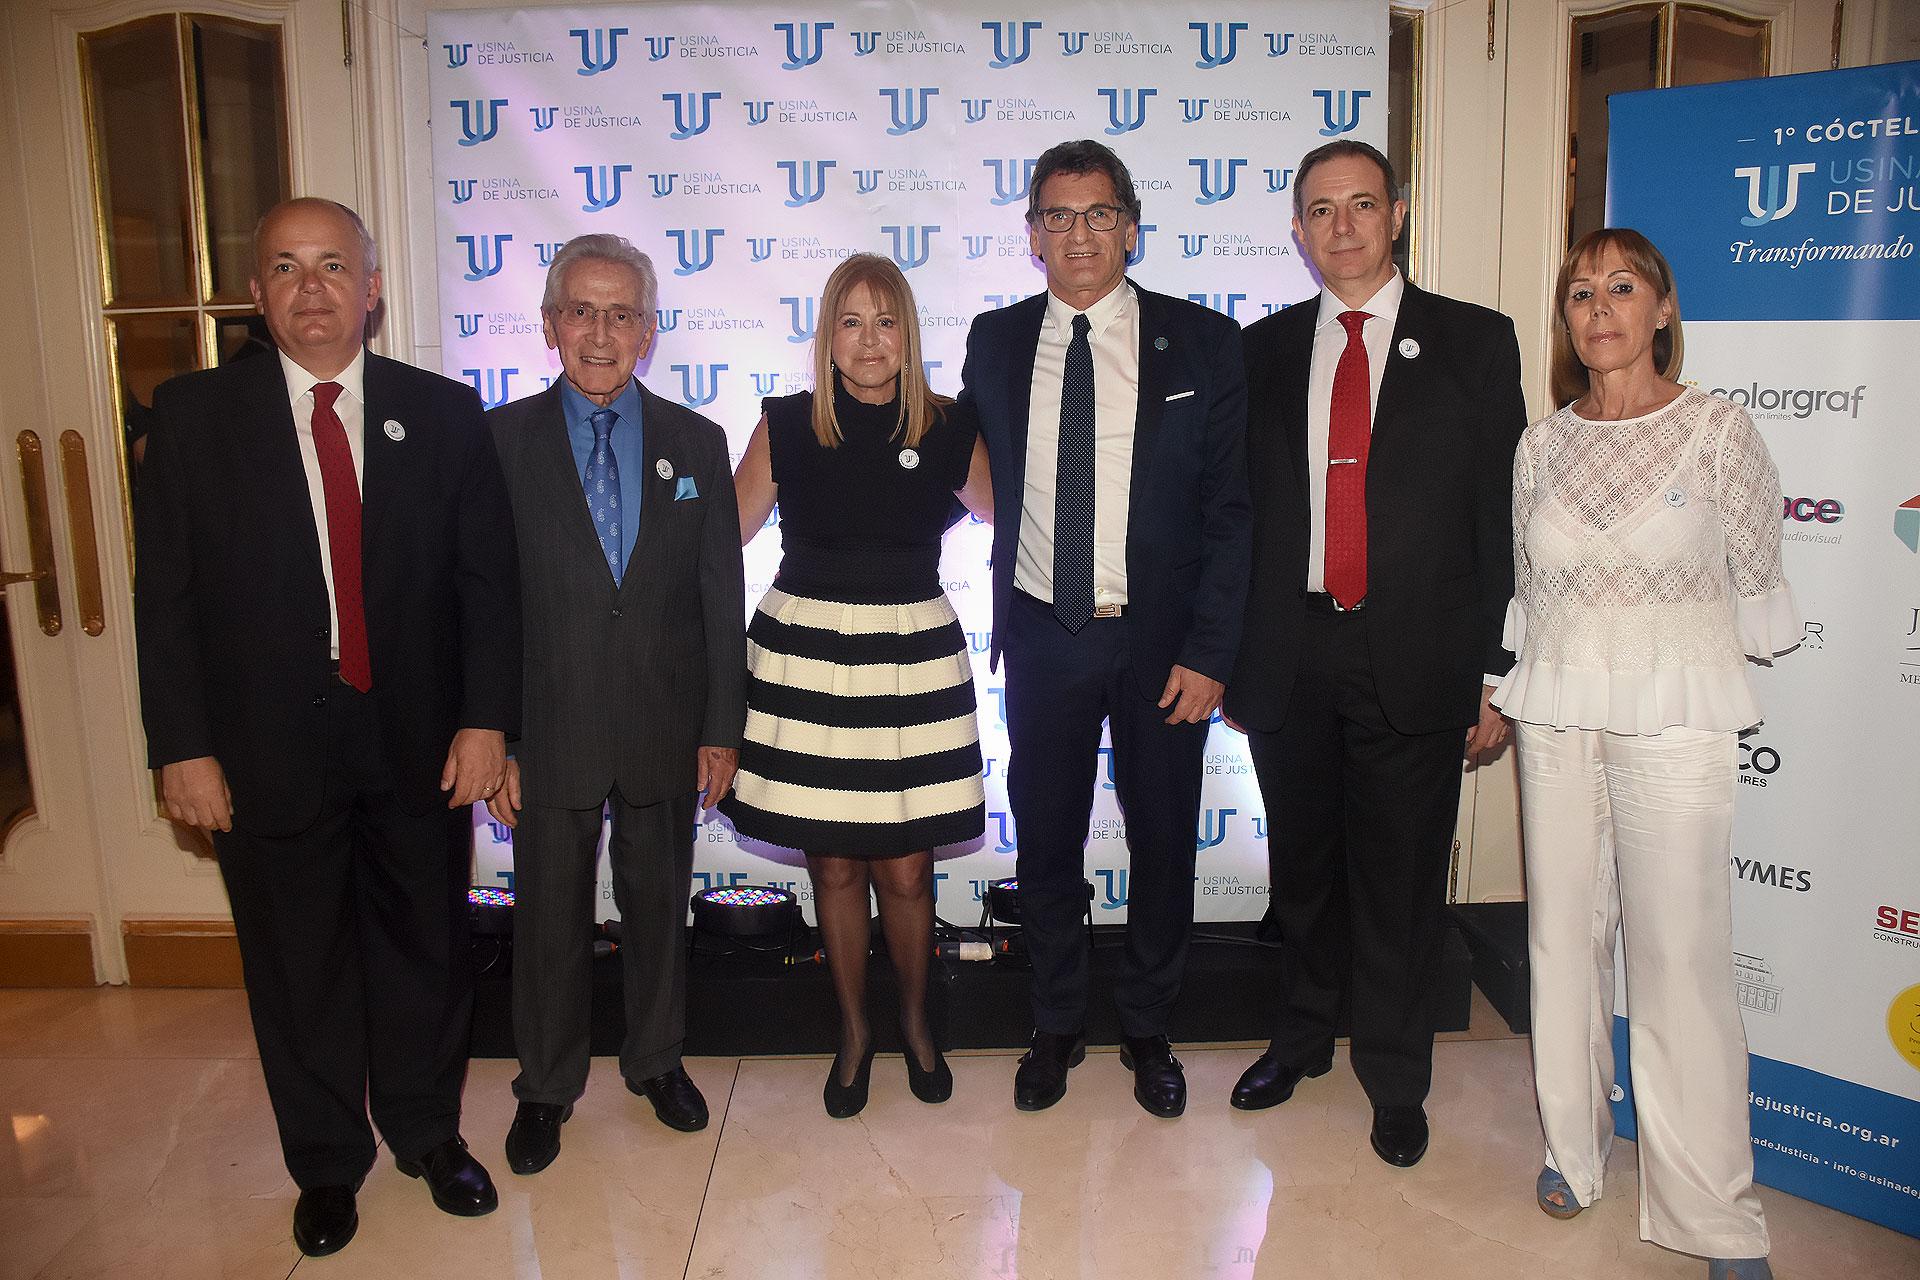 Alejandro Fargosi, Marcos Aguinis, Diana Cohen Agrest, Claudio Avruj, Franklin Rawson y Marcela Dal Verme